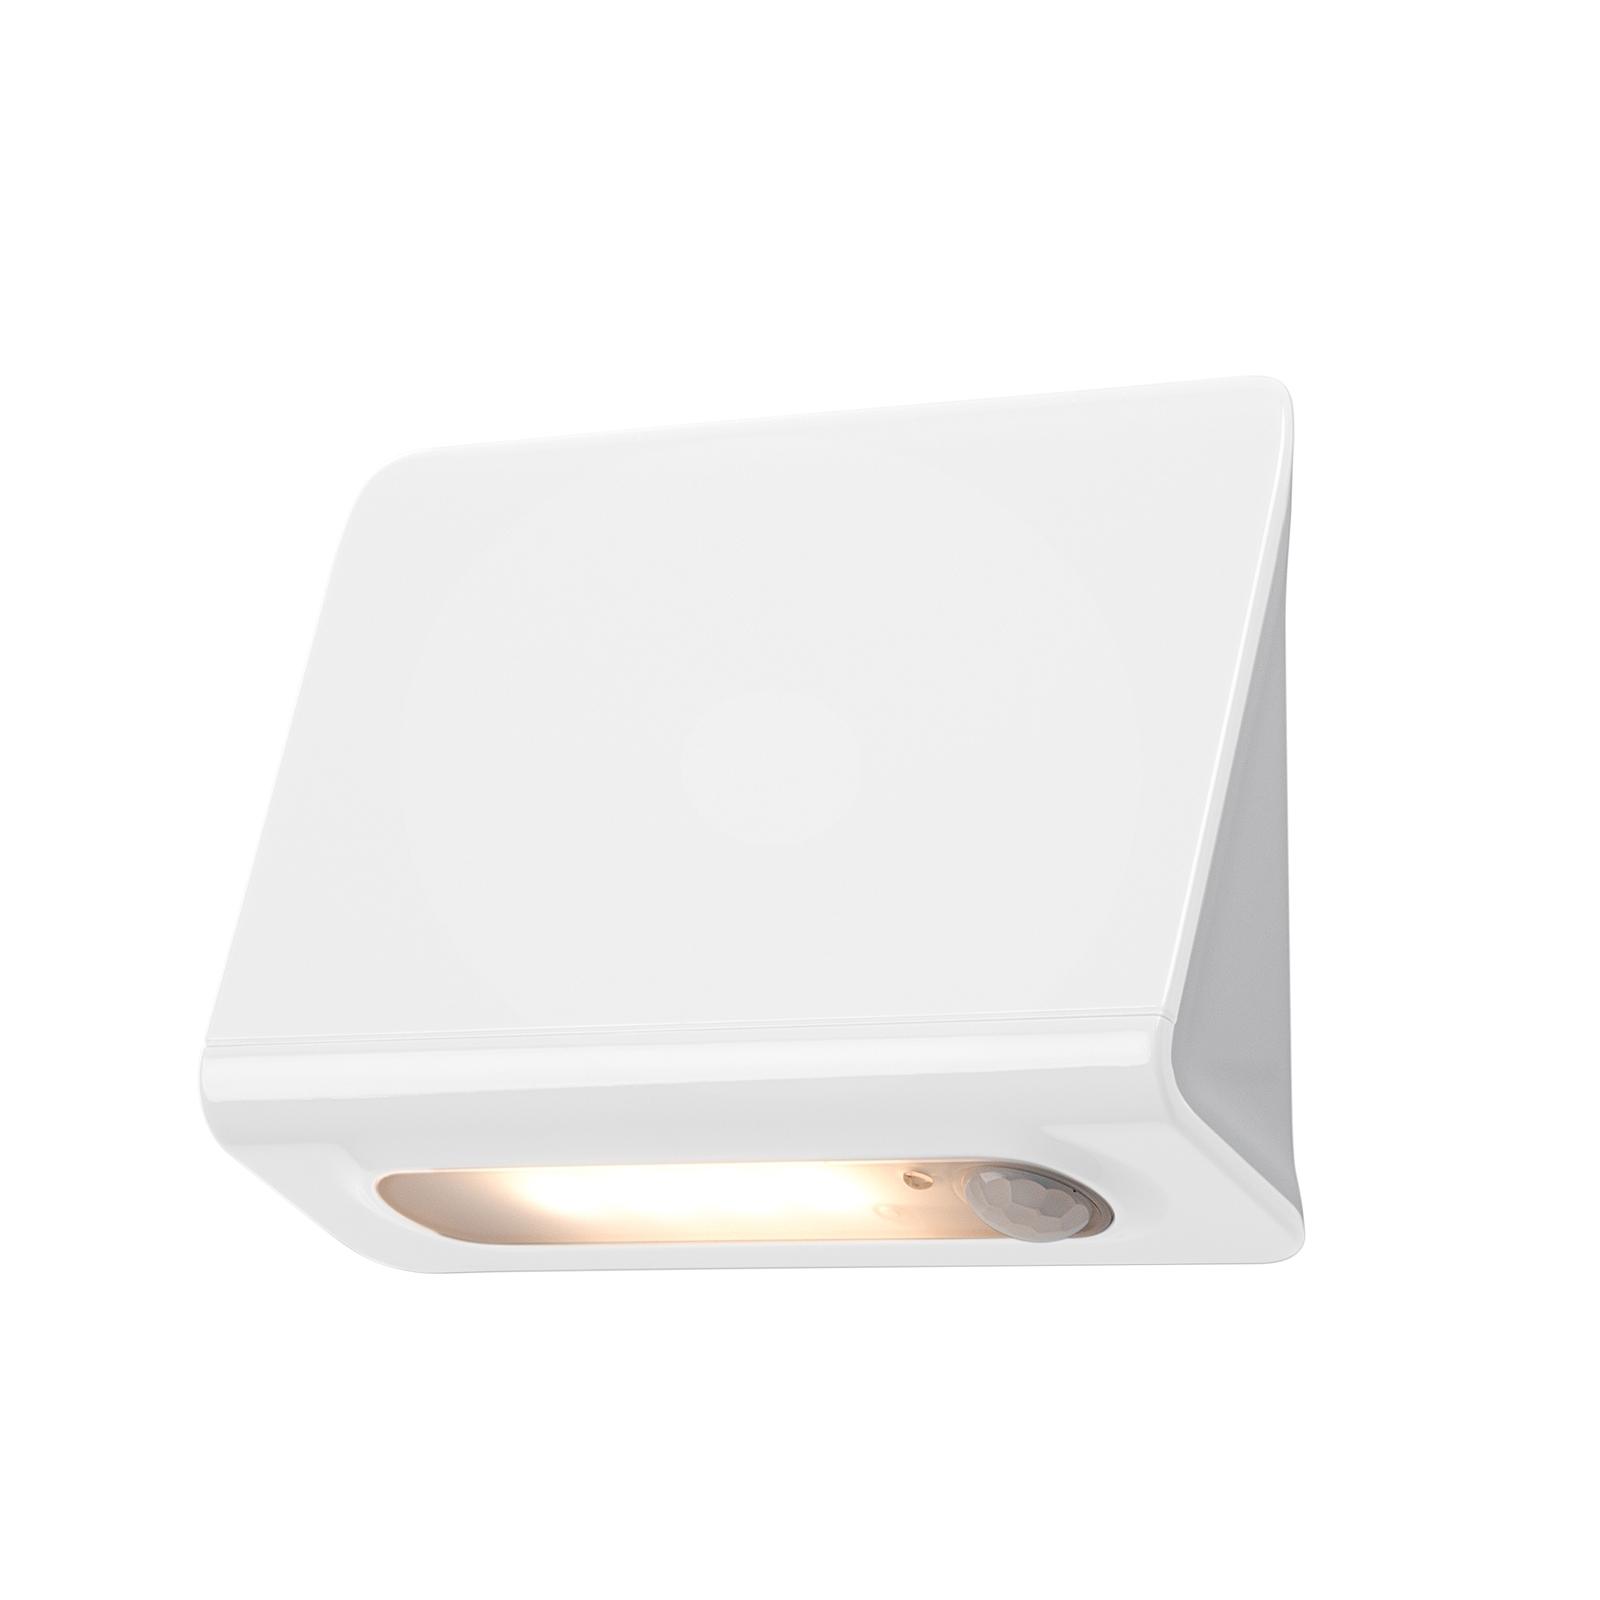 Arlec Battery Operated Sensor Night Light